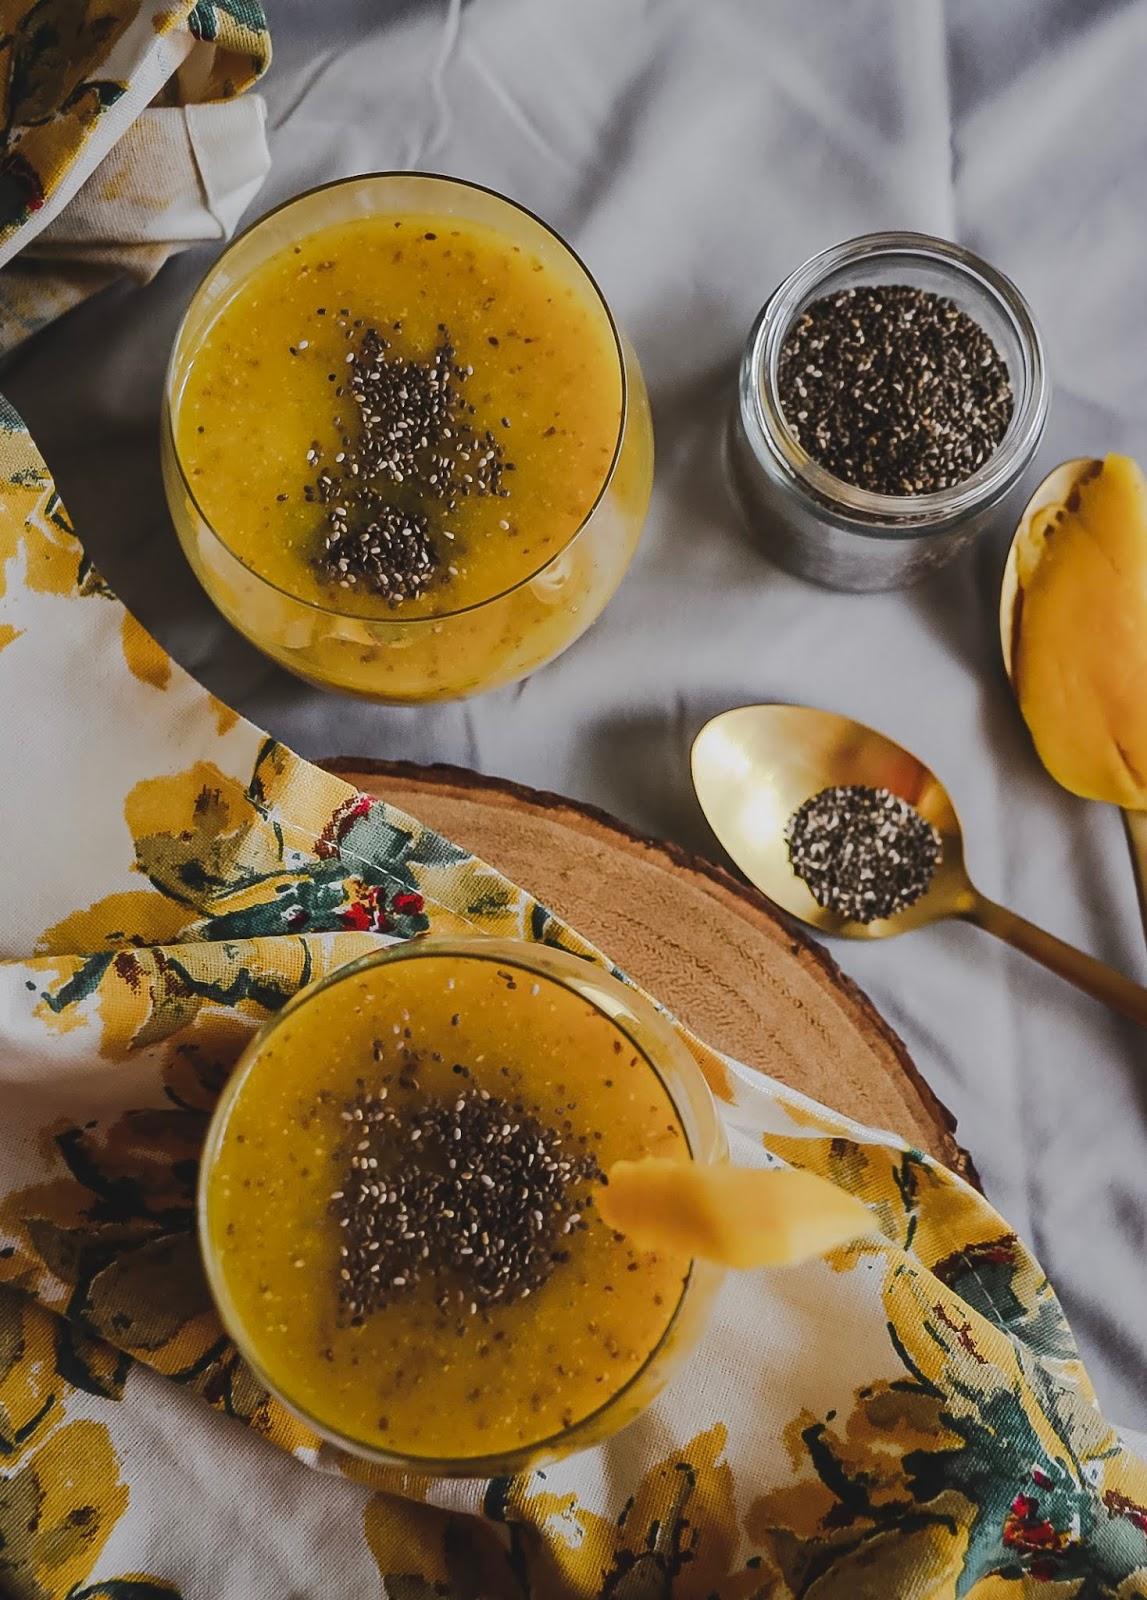 chia drink, mango coconut chia drink, summer drink, mango, vegan, gluten free drink, food, myriad musings.